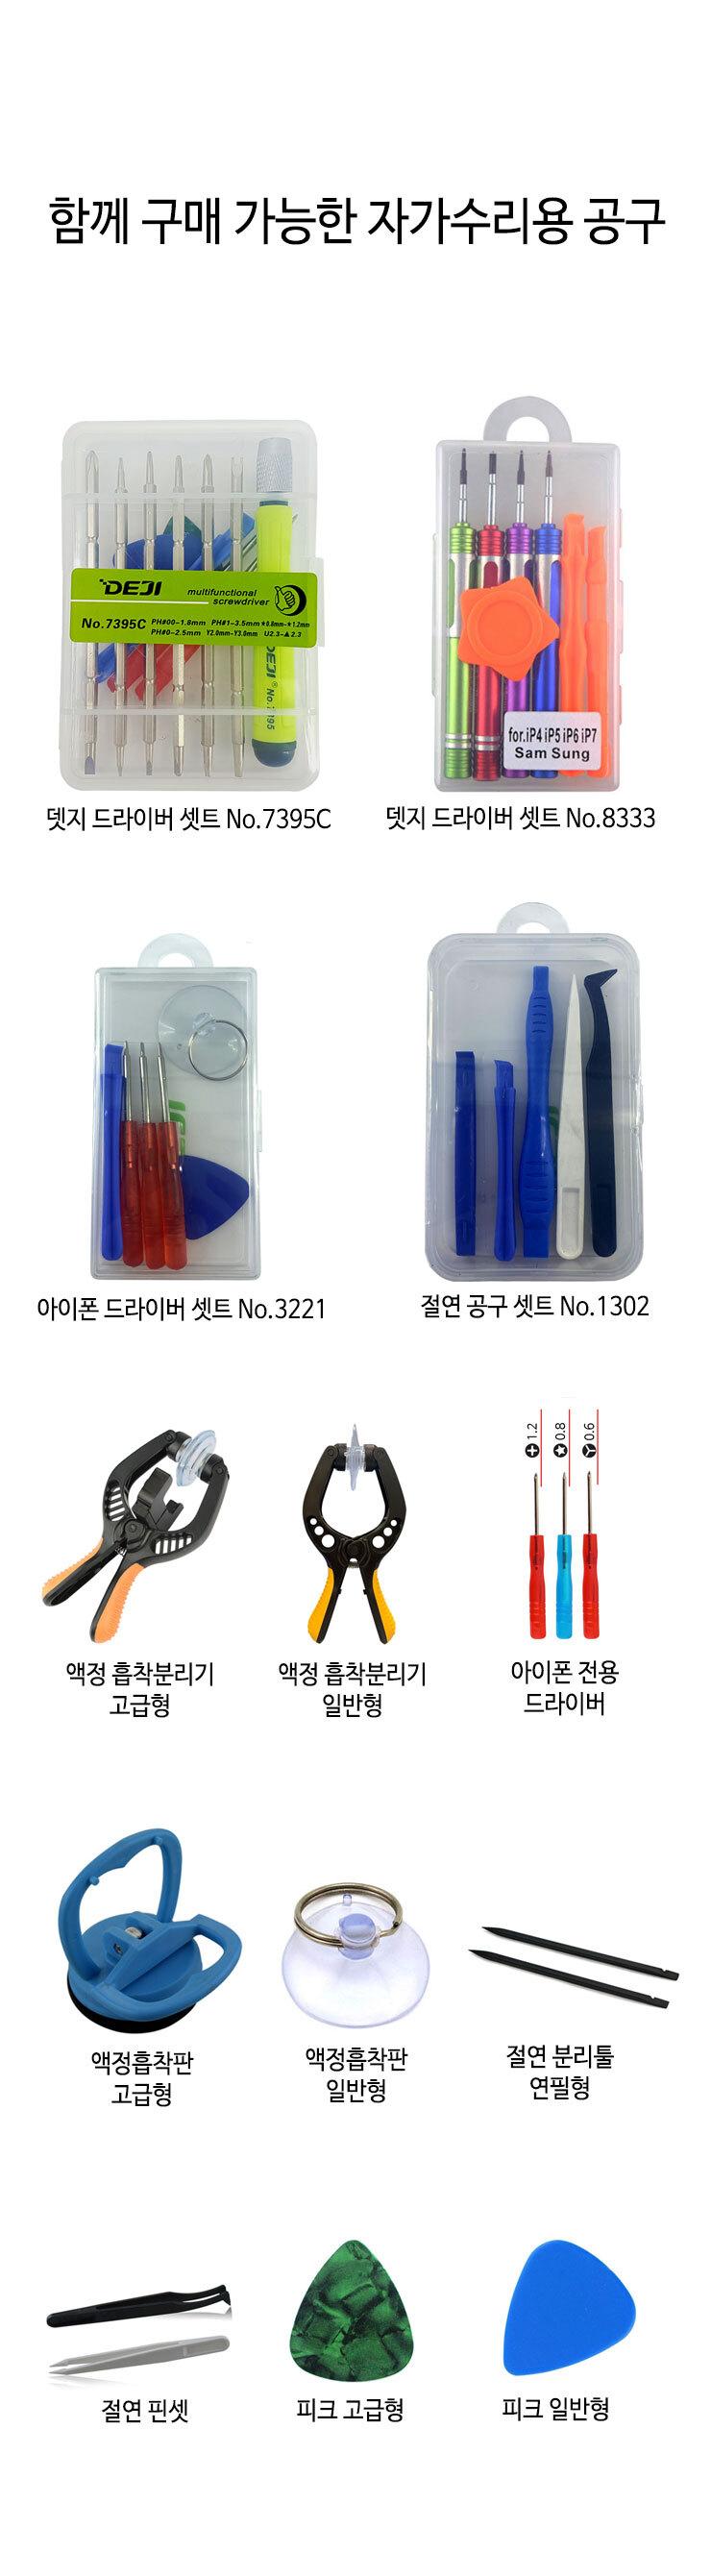 tool-all.jpg